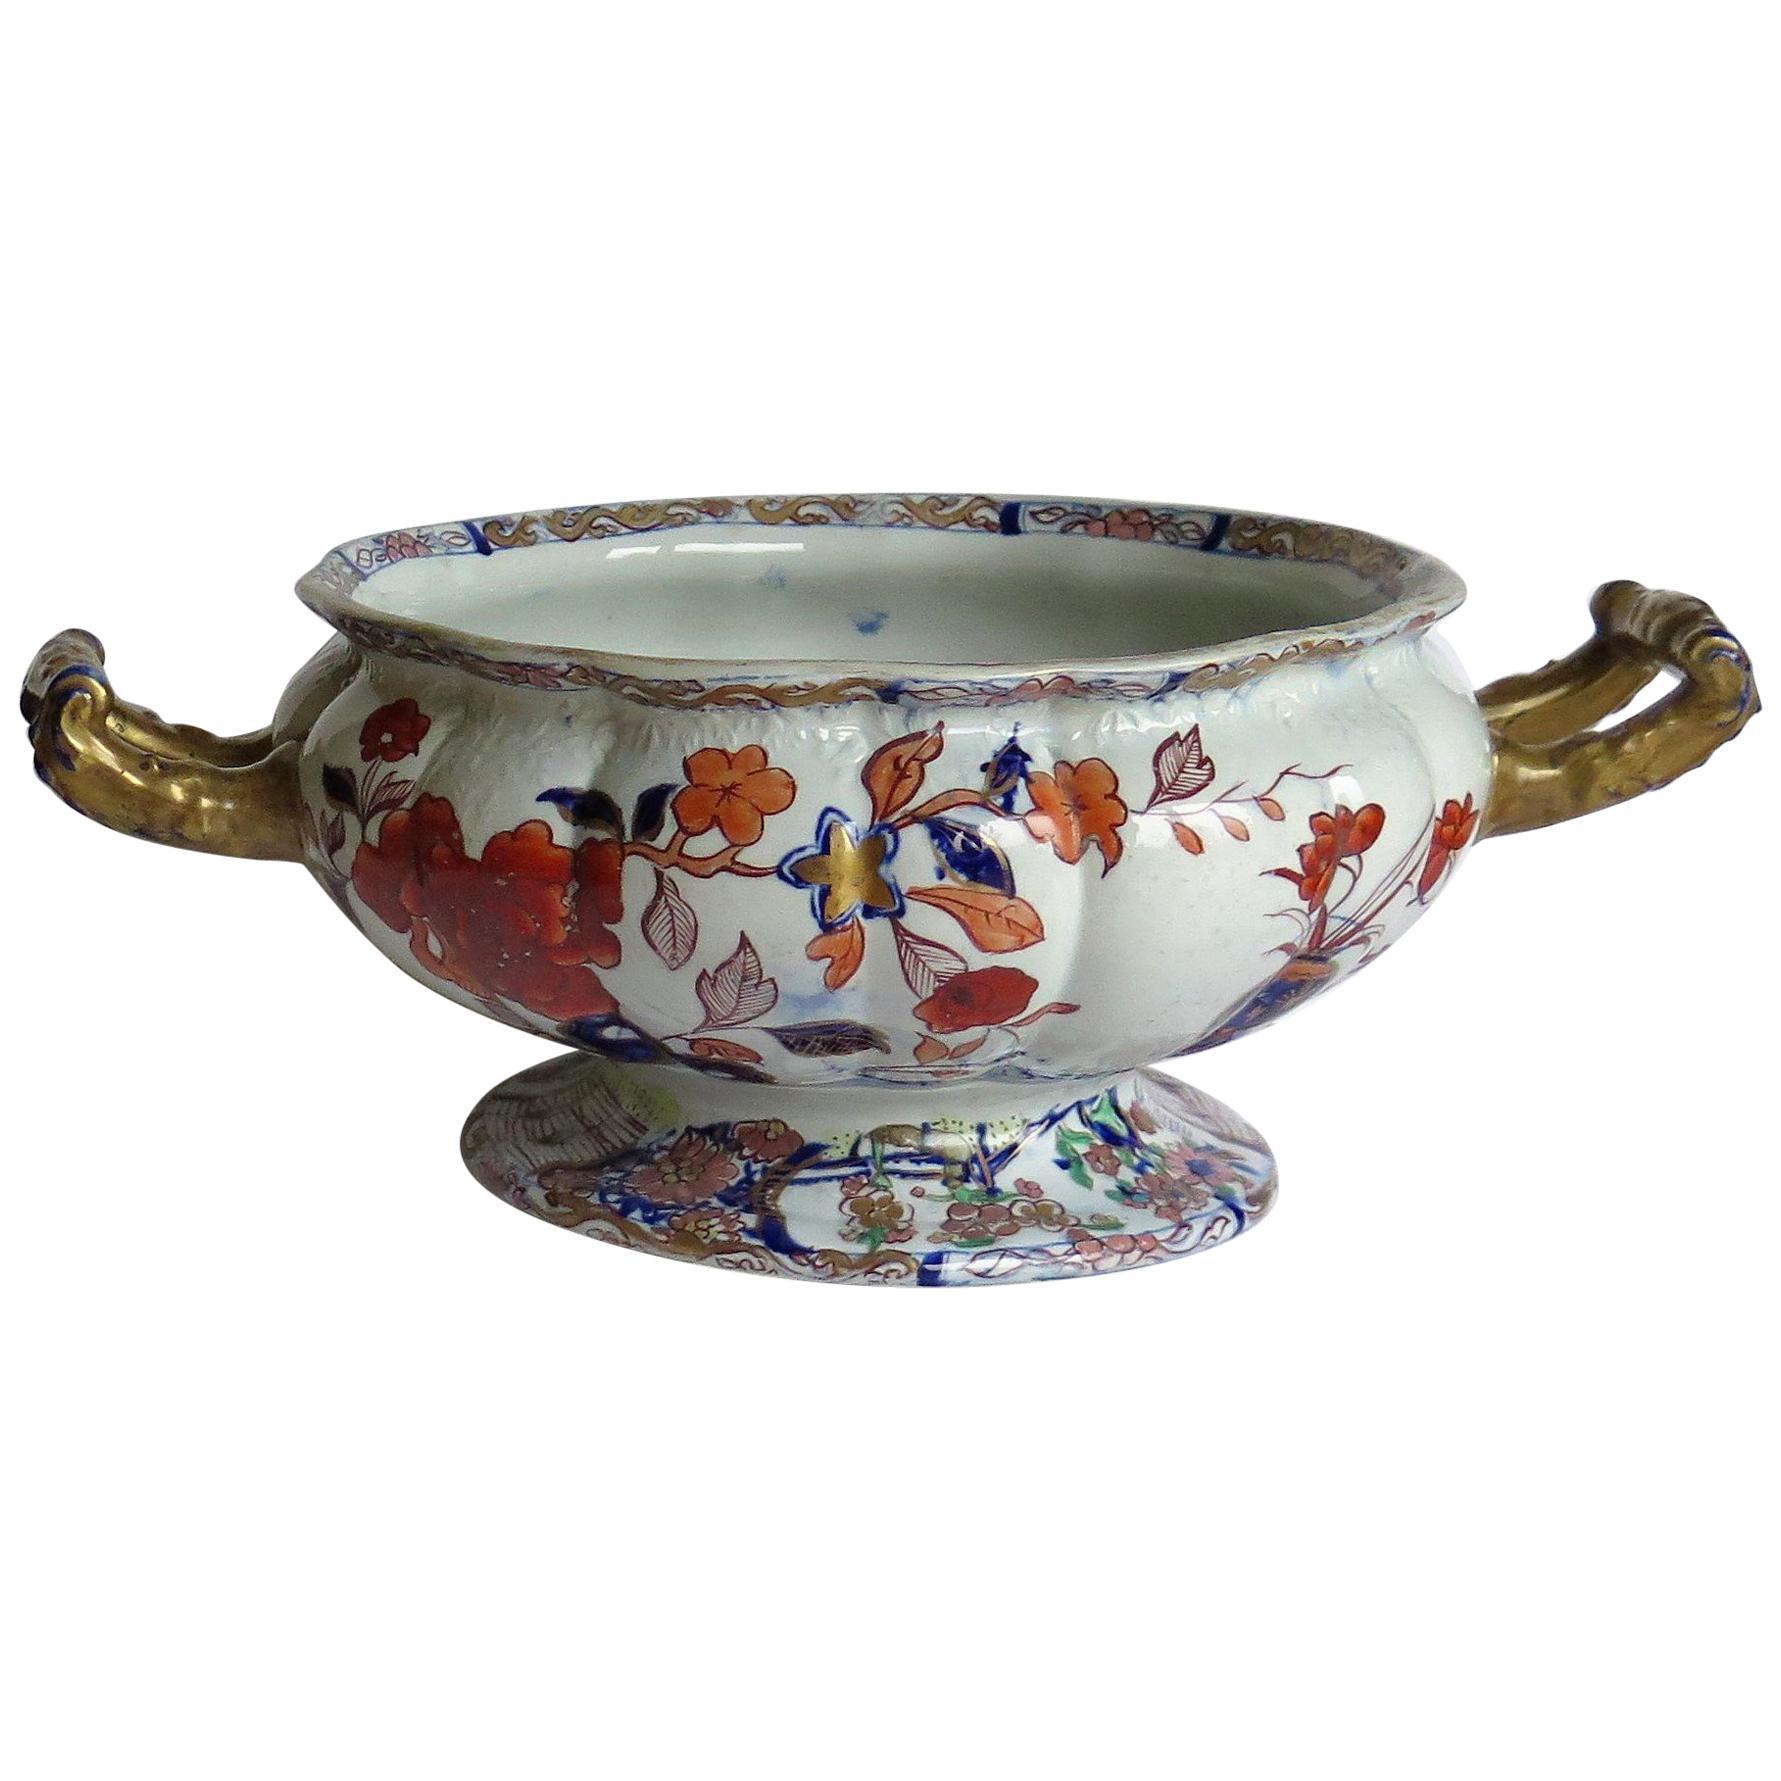 Very Large Rare Early Mason's Ironstone Bowl in Peking Vase Pattern, circa 1820